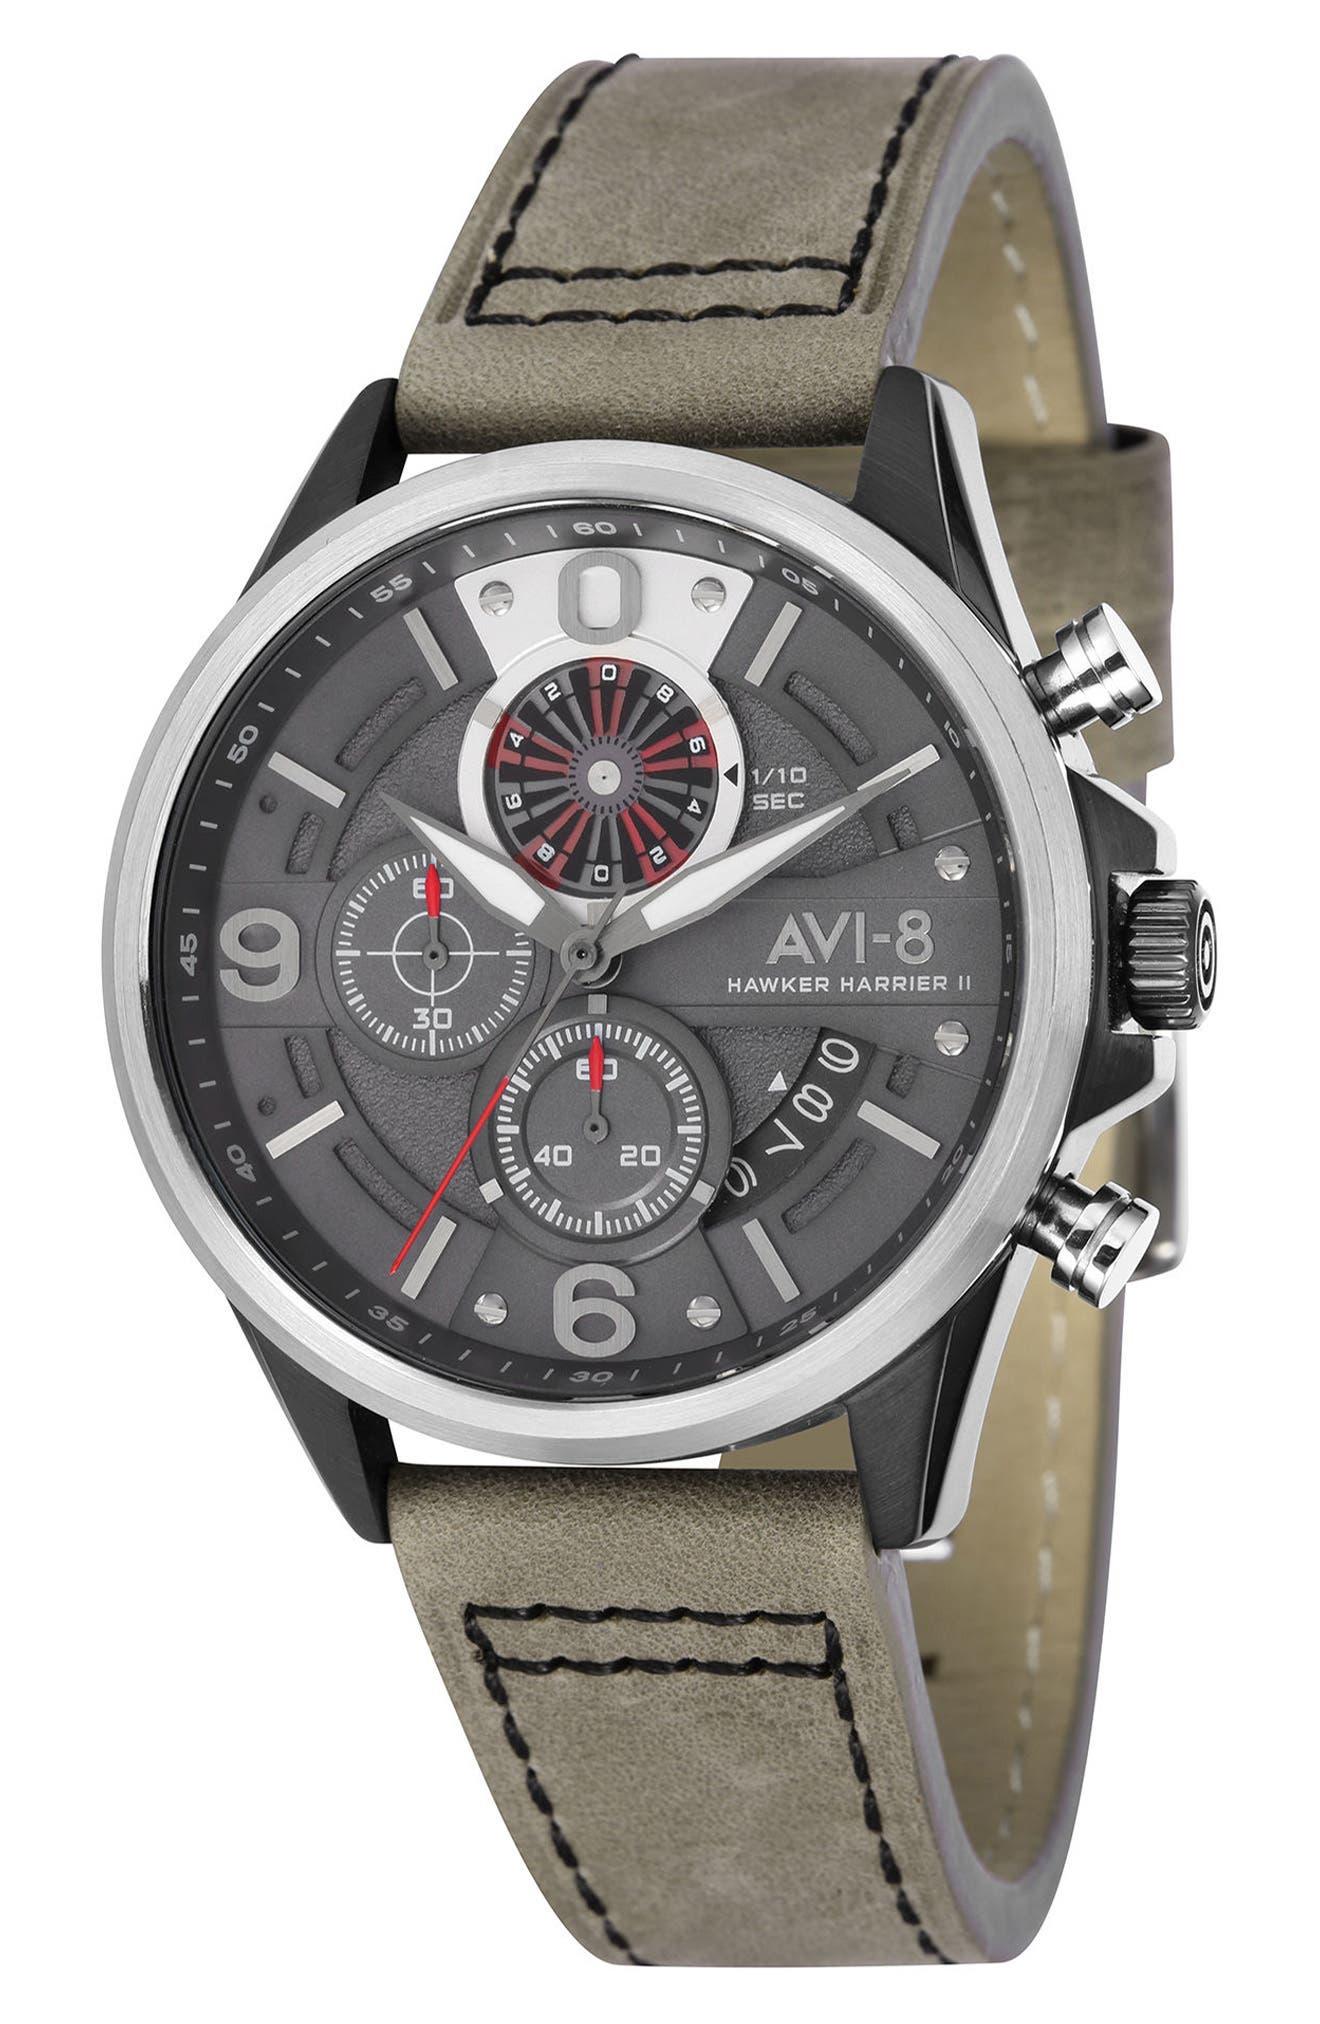 Main Image - AVI-8 Hawker Harrier II Turbine Chronograph Leather Strap Watch, 45mm